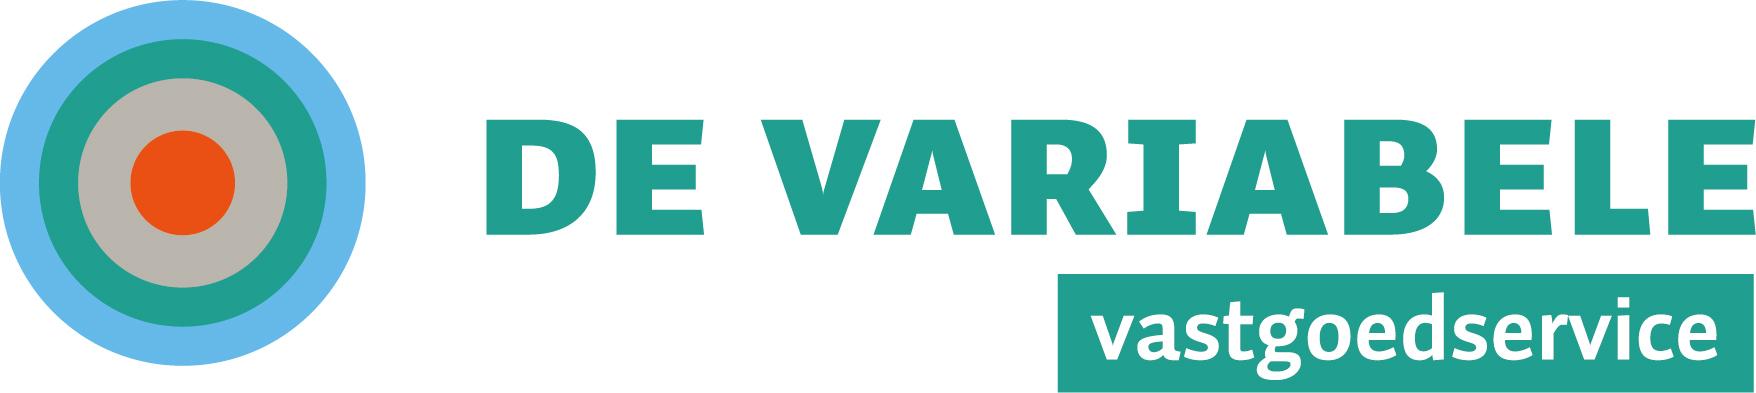 De Variabele logo